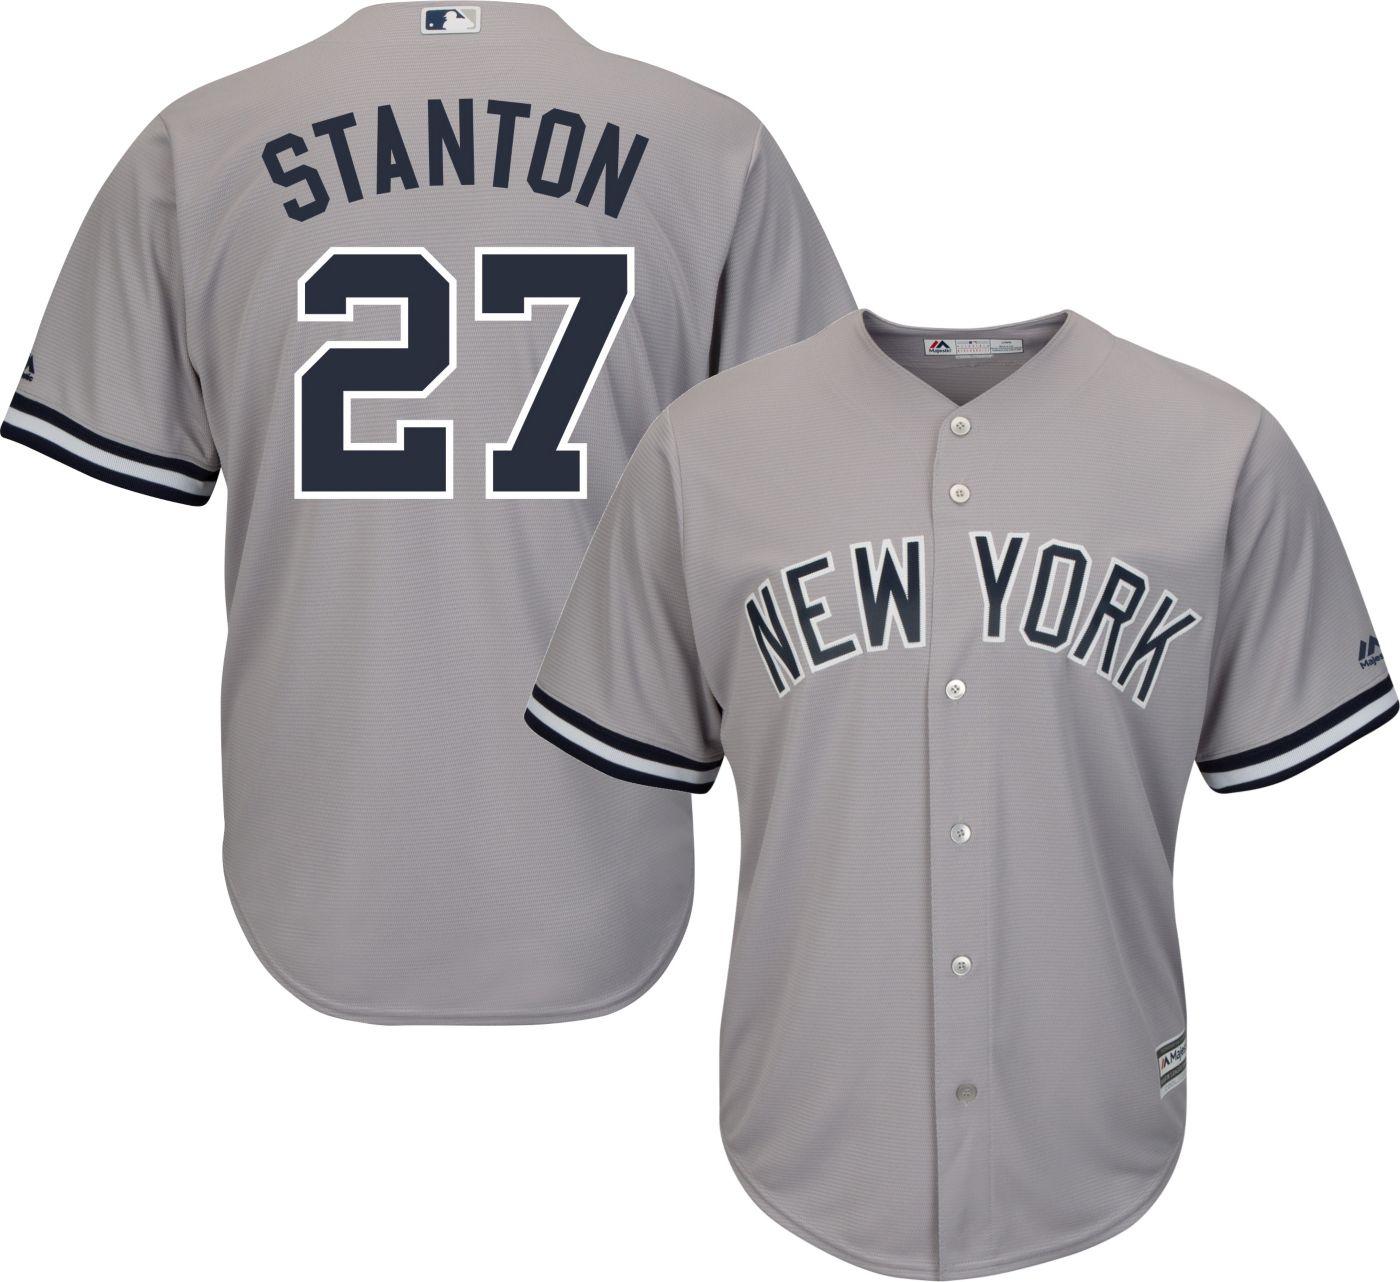 Majestic Men's Replica New York Yankees Giancarlo Stanton #27 Cool Base Road Grey Jersey